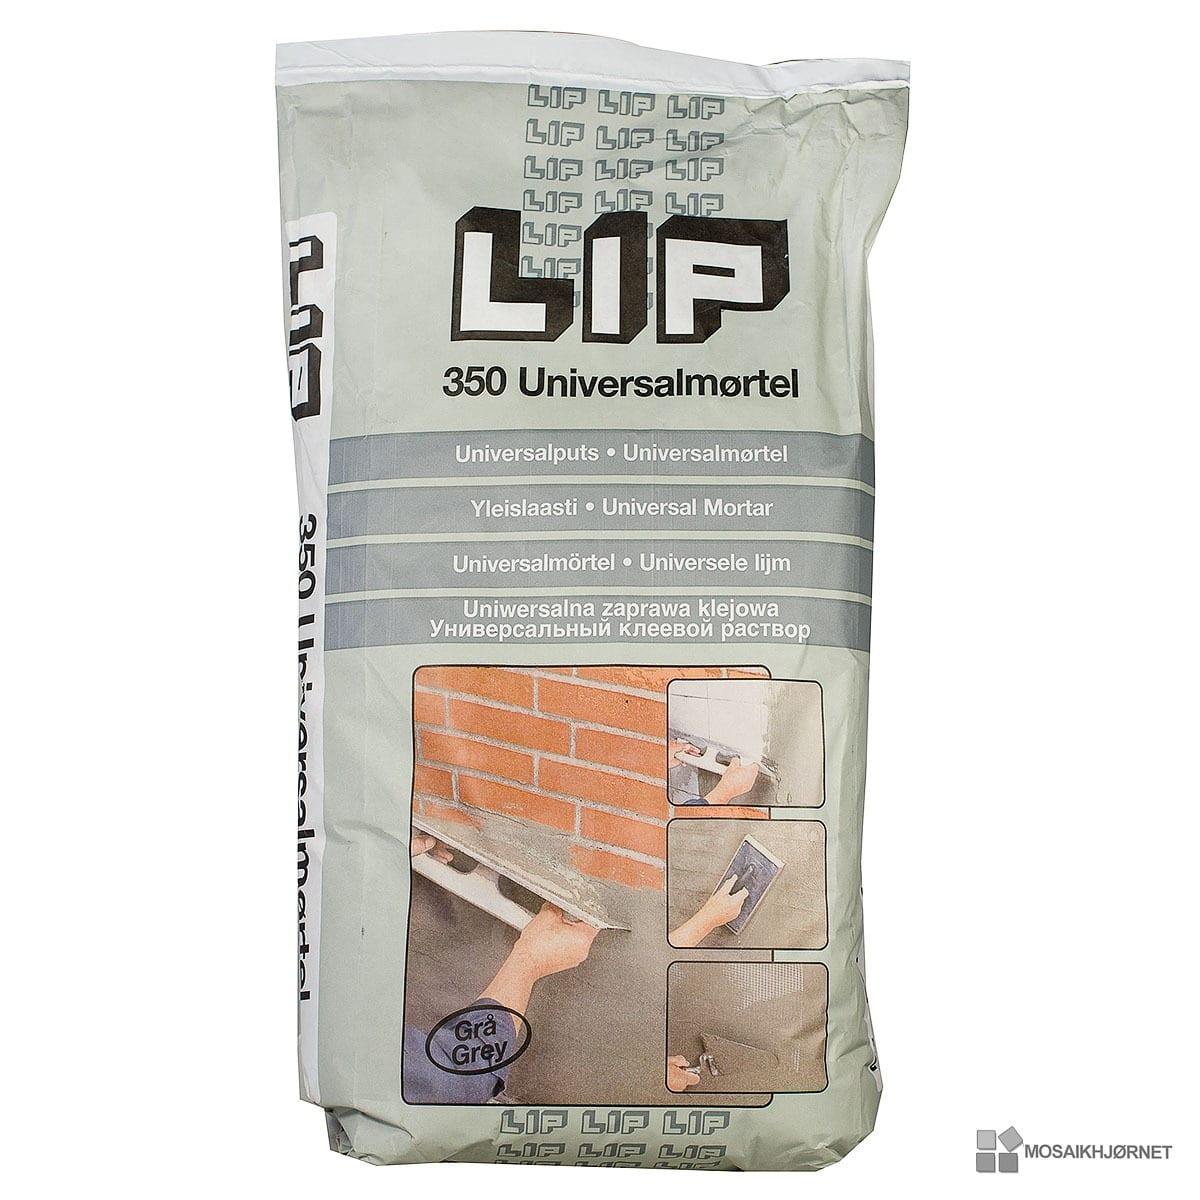 Lip 228 pris